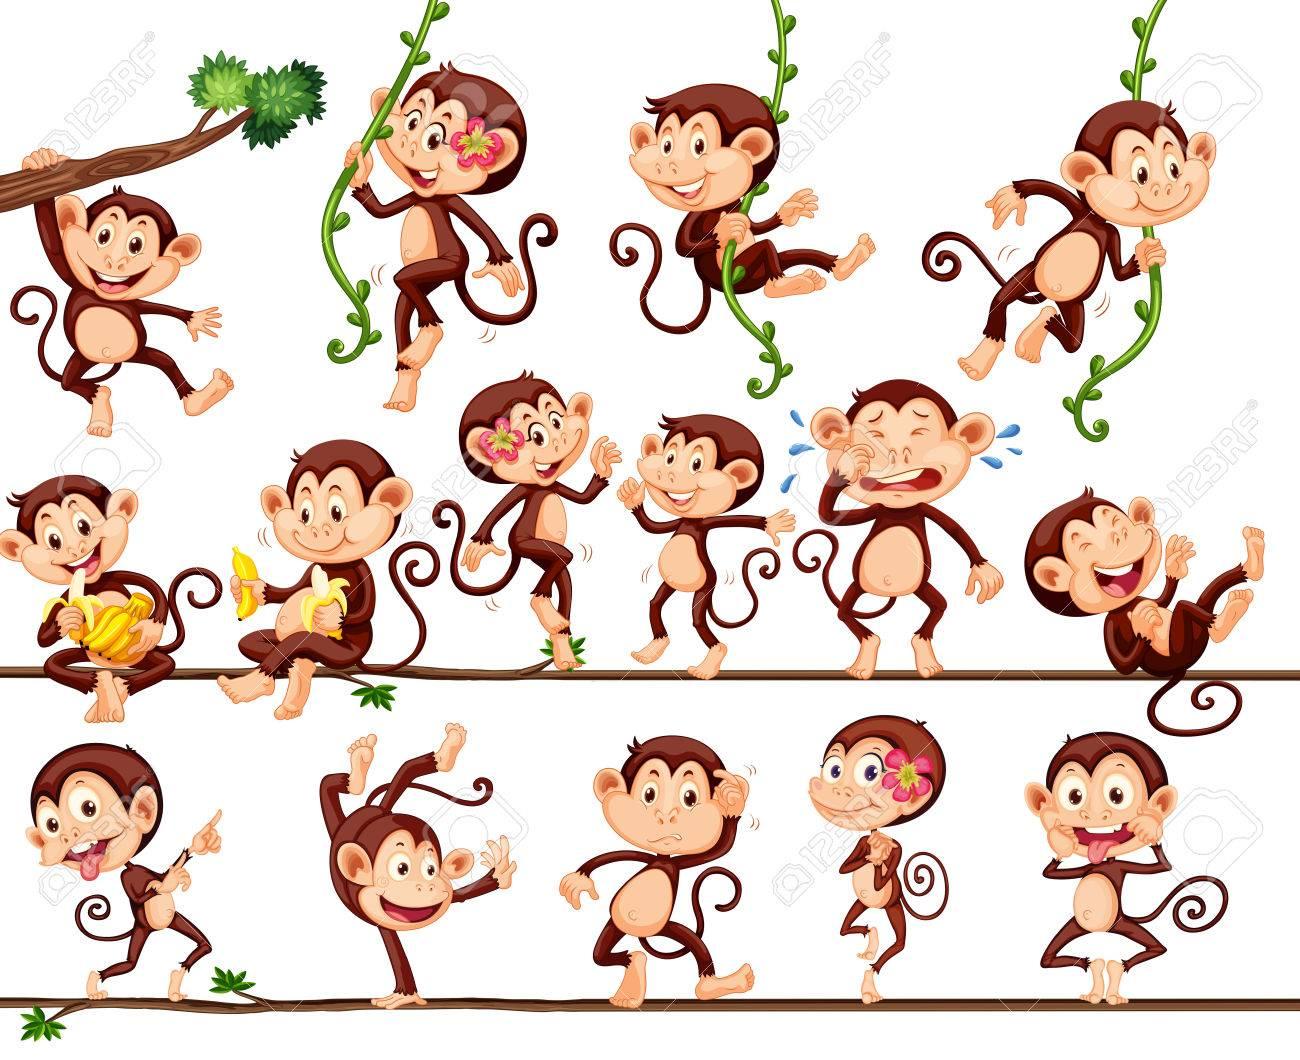 Monkeys doing different actions illustration - 51244462